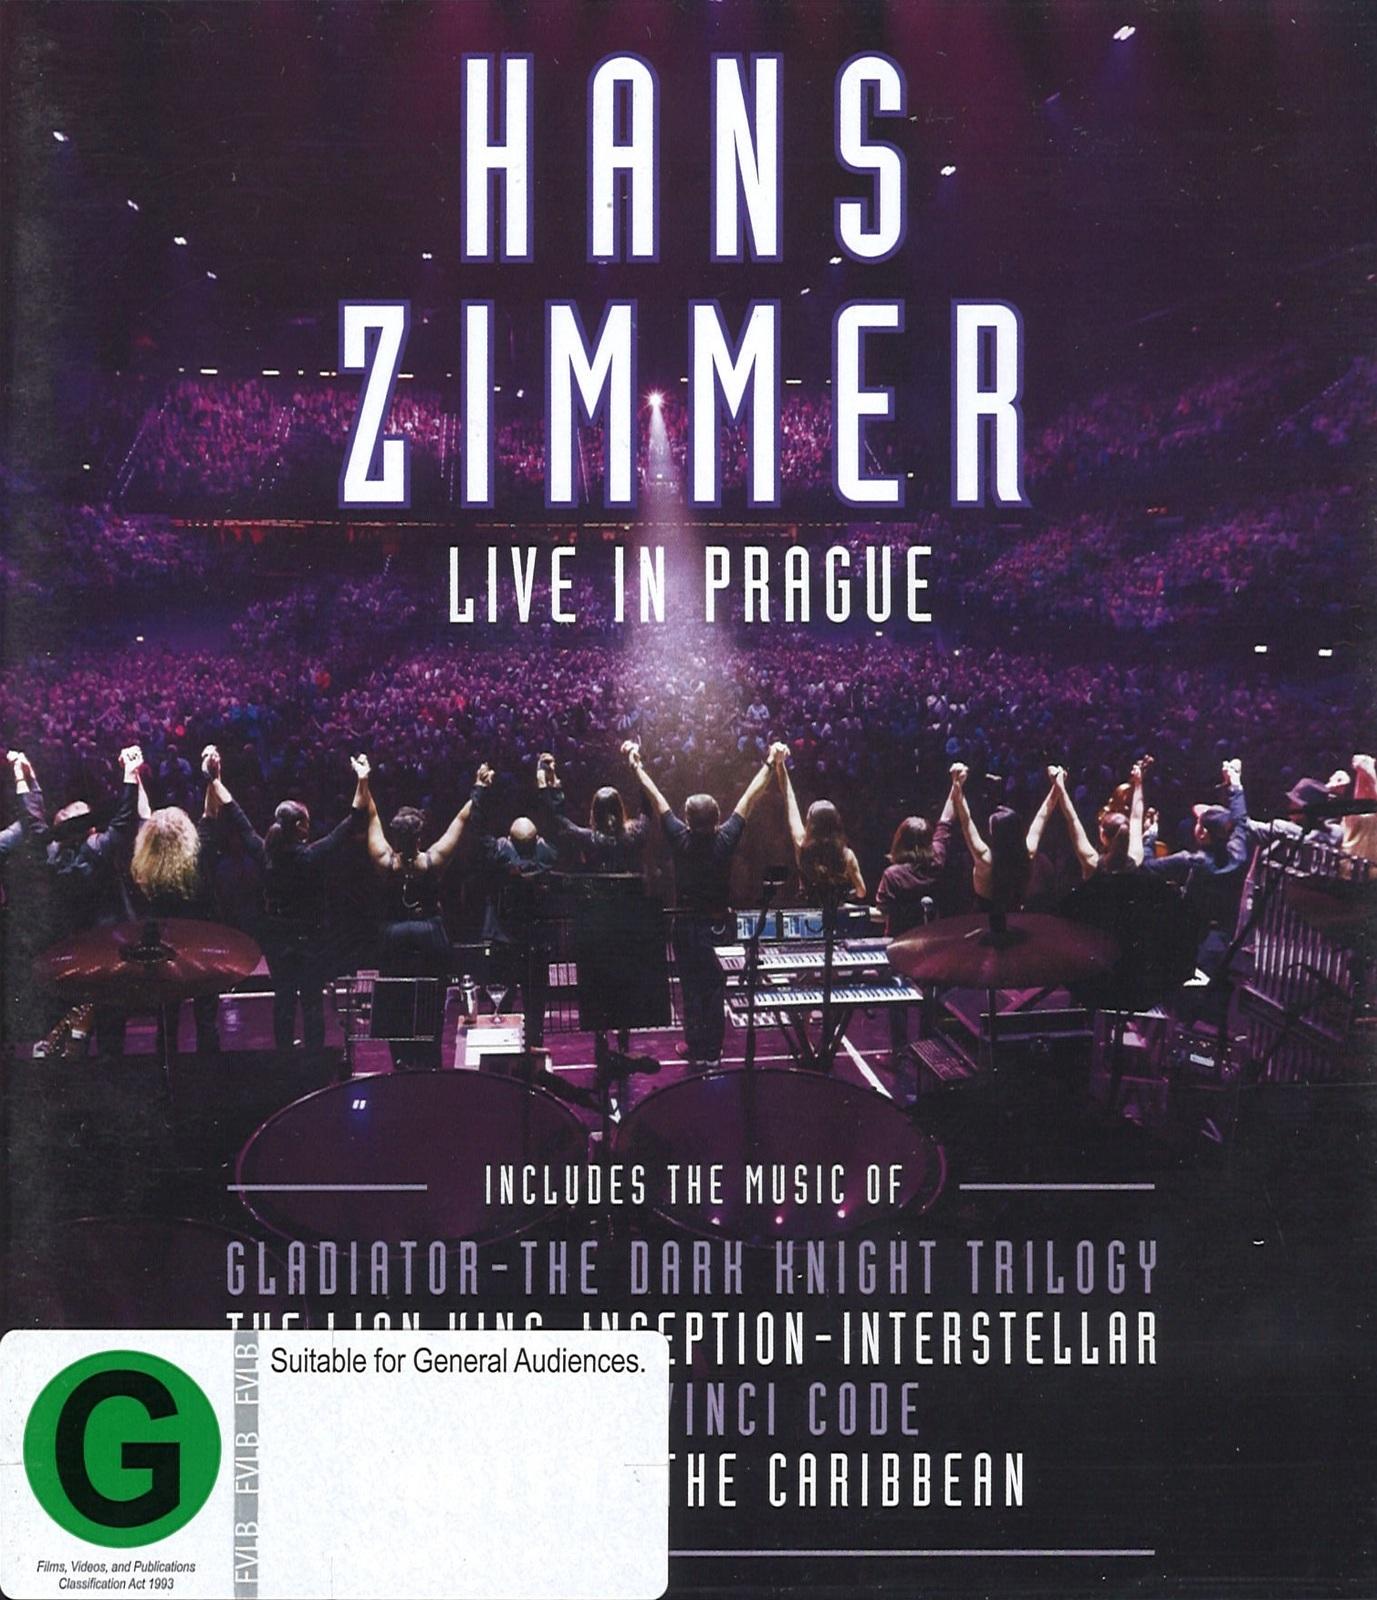 Hans Zimmer: Live in Prague on Blu-ray image